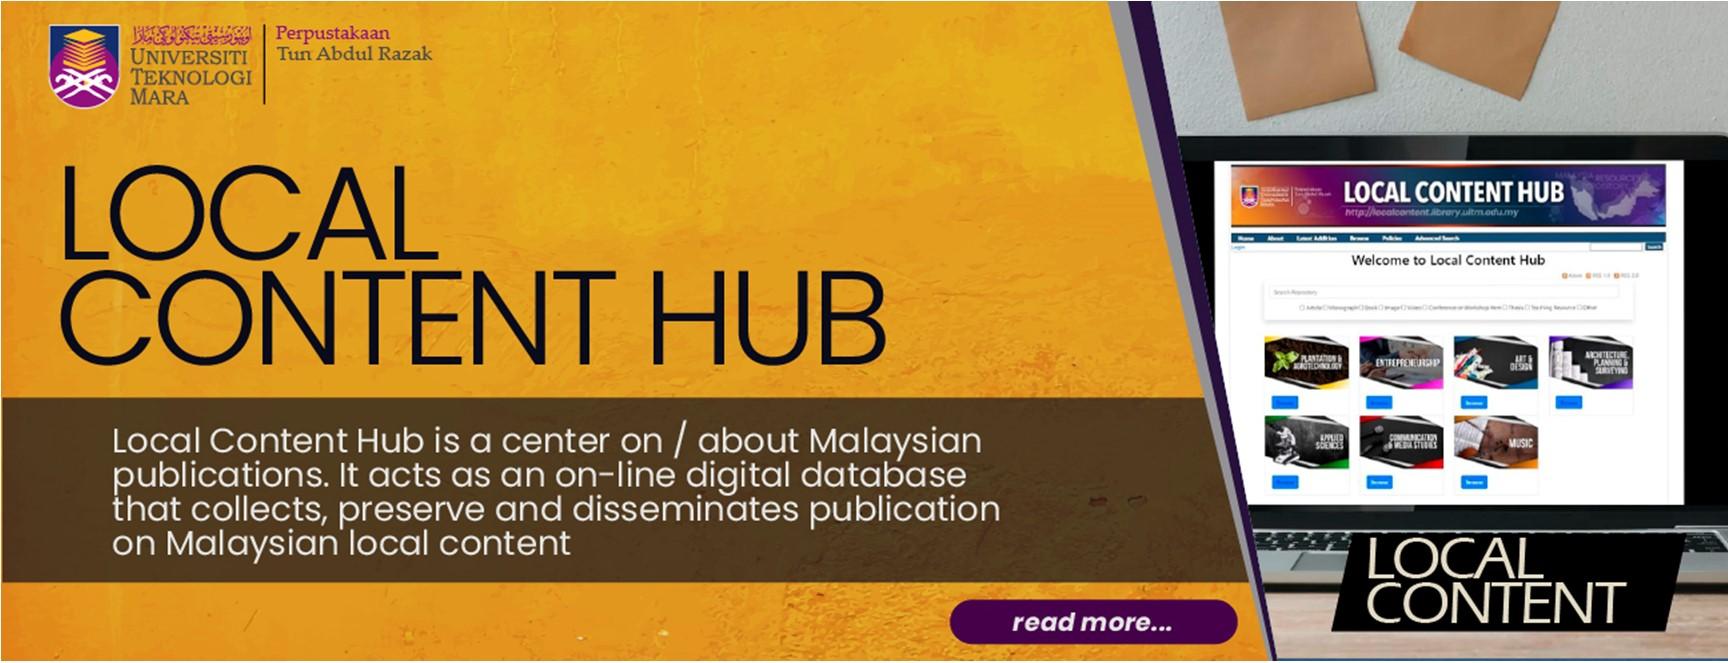 Local Content Hub